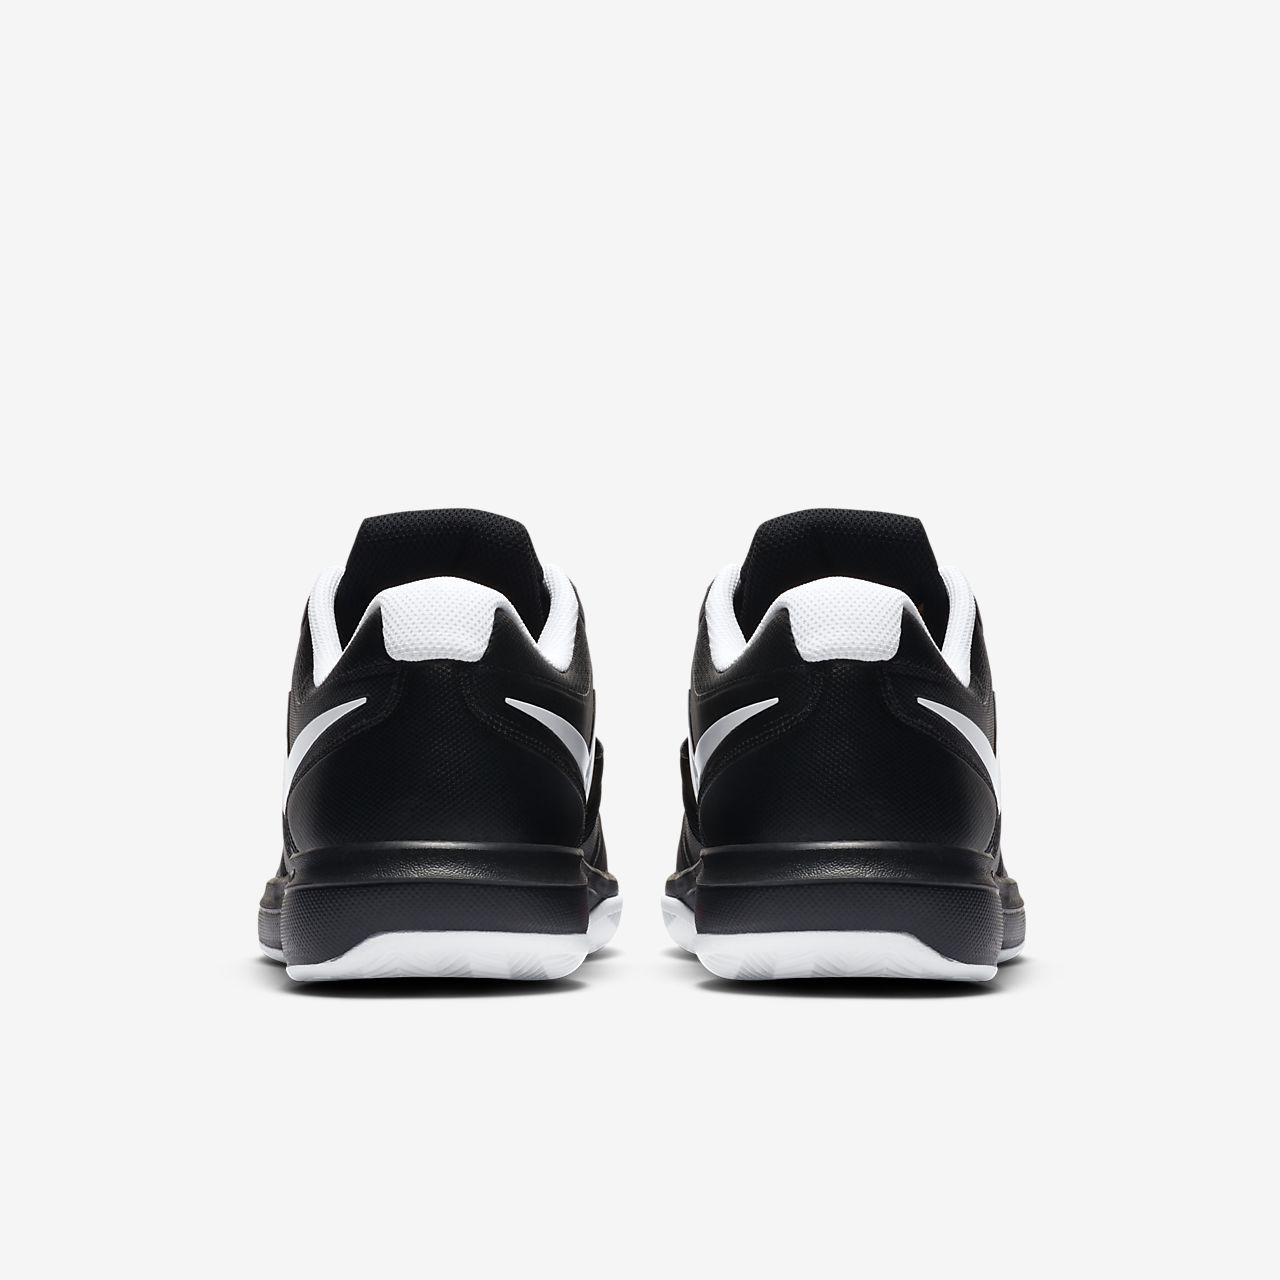 d963d1e9de7f Nike Air Zoom Prestige Clay Men s Tennis Shoe. Nike.com AU